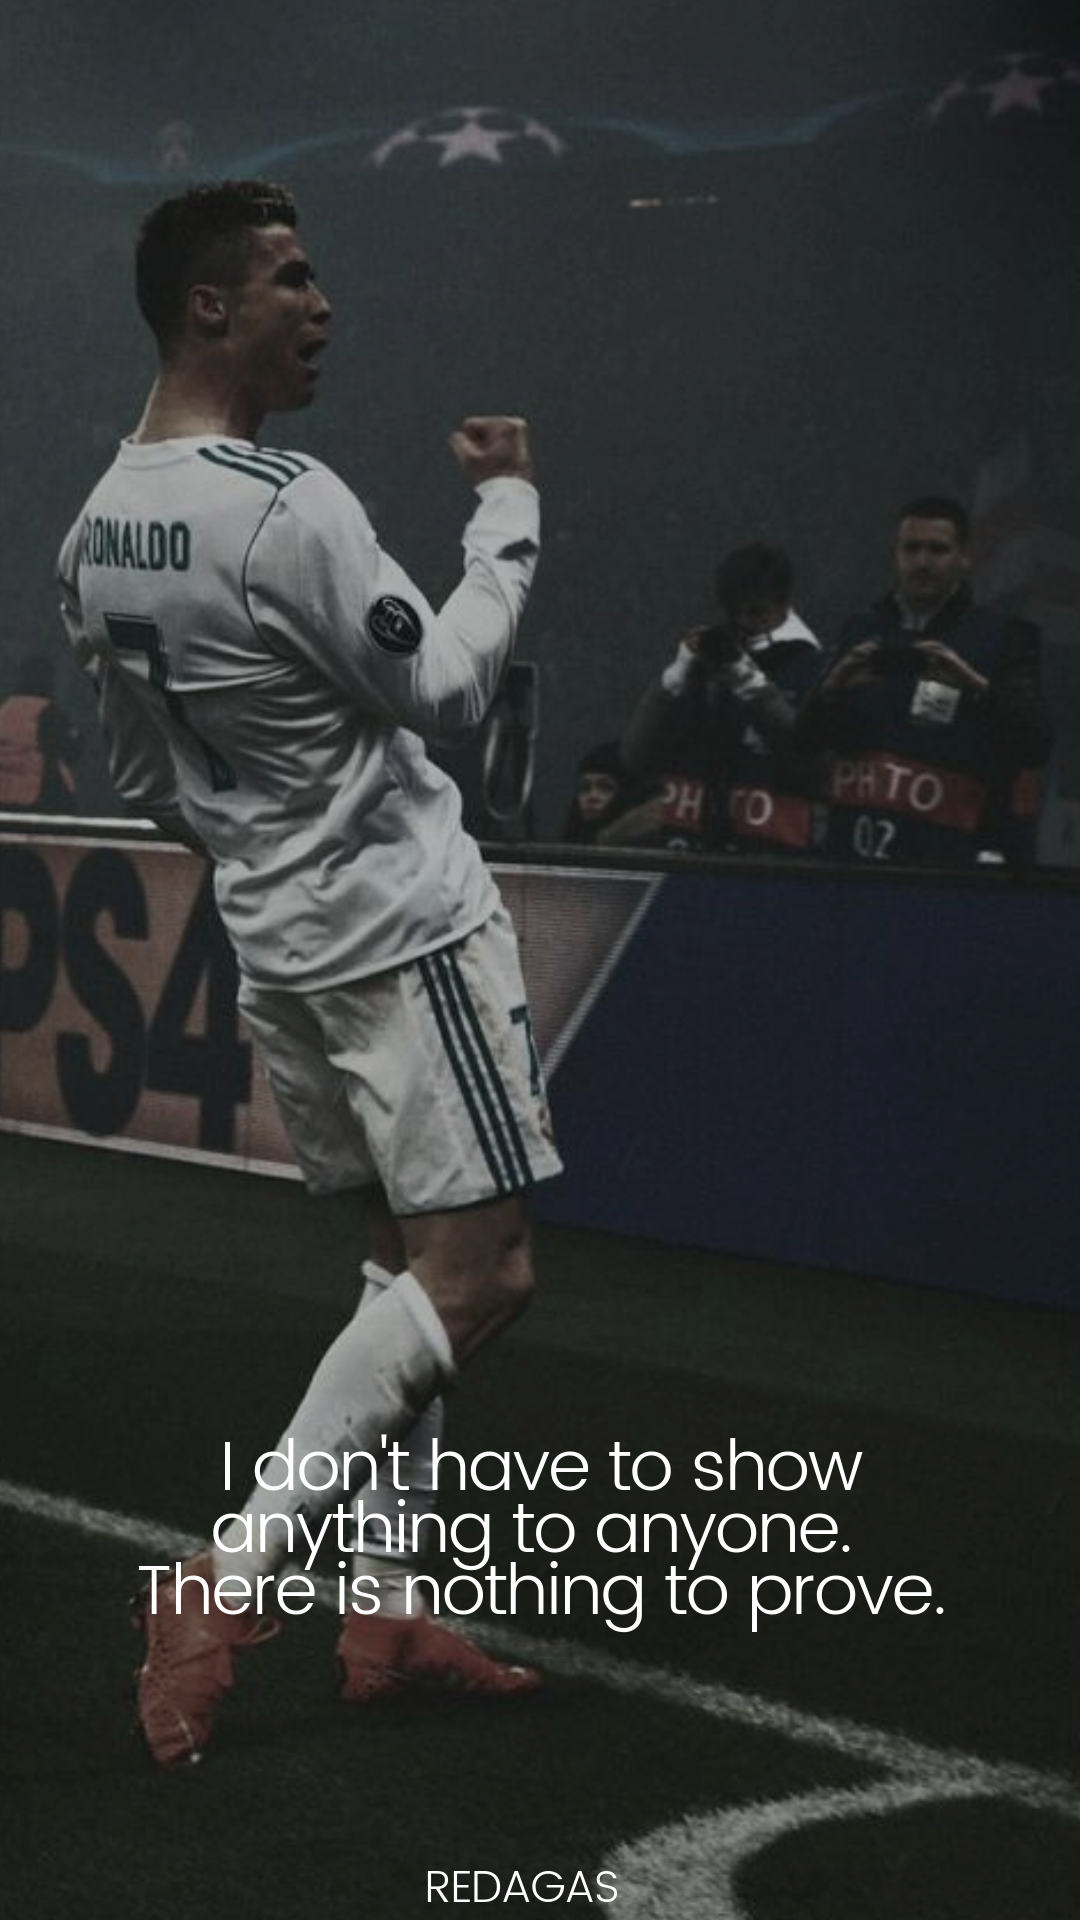 Cristiano Ronaldo Quotes Ronaldo Quotes Cristiano Ronaldo Quotes Christiano Ronaldo Quotes